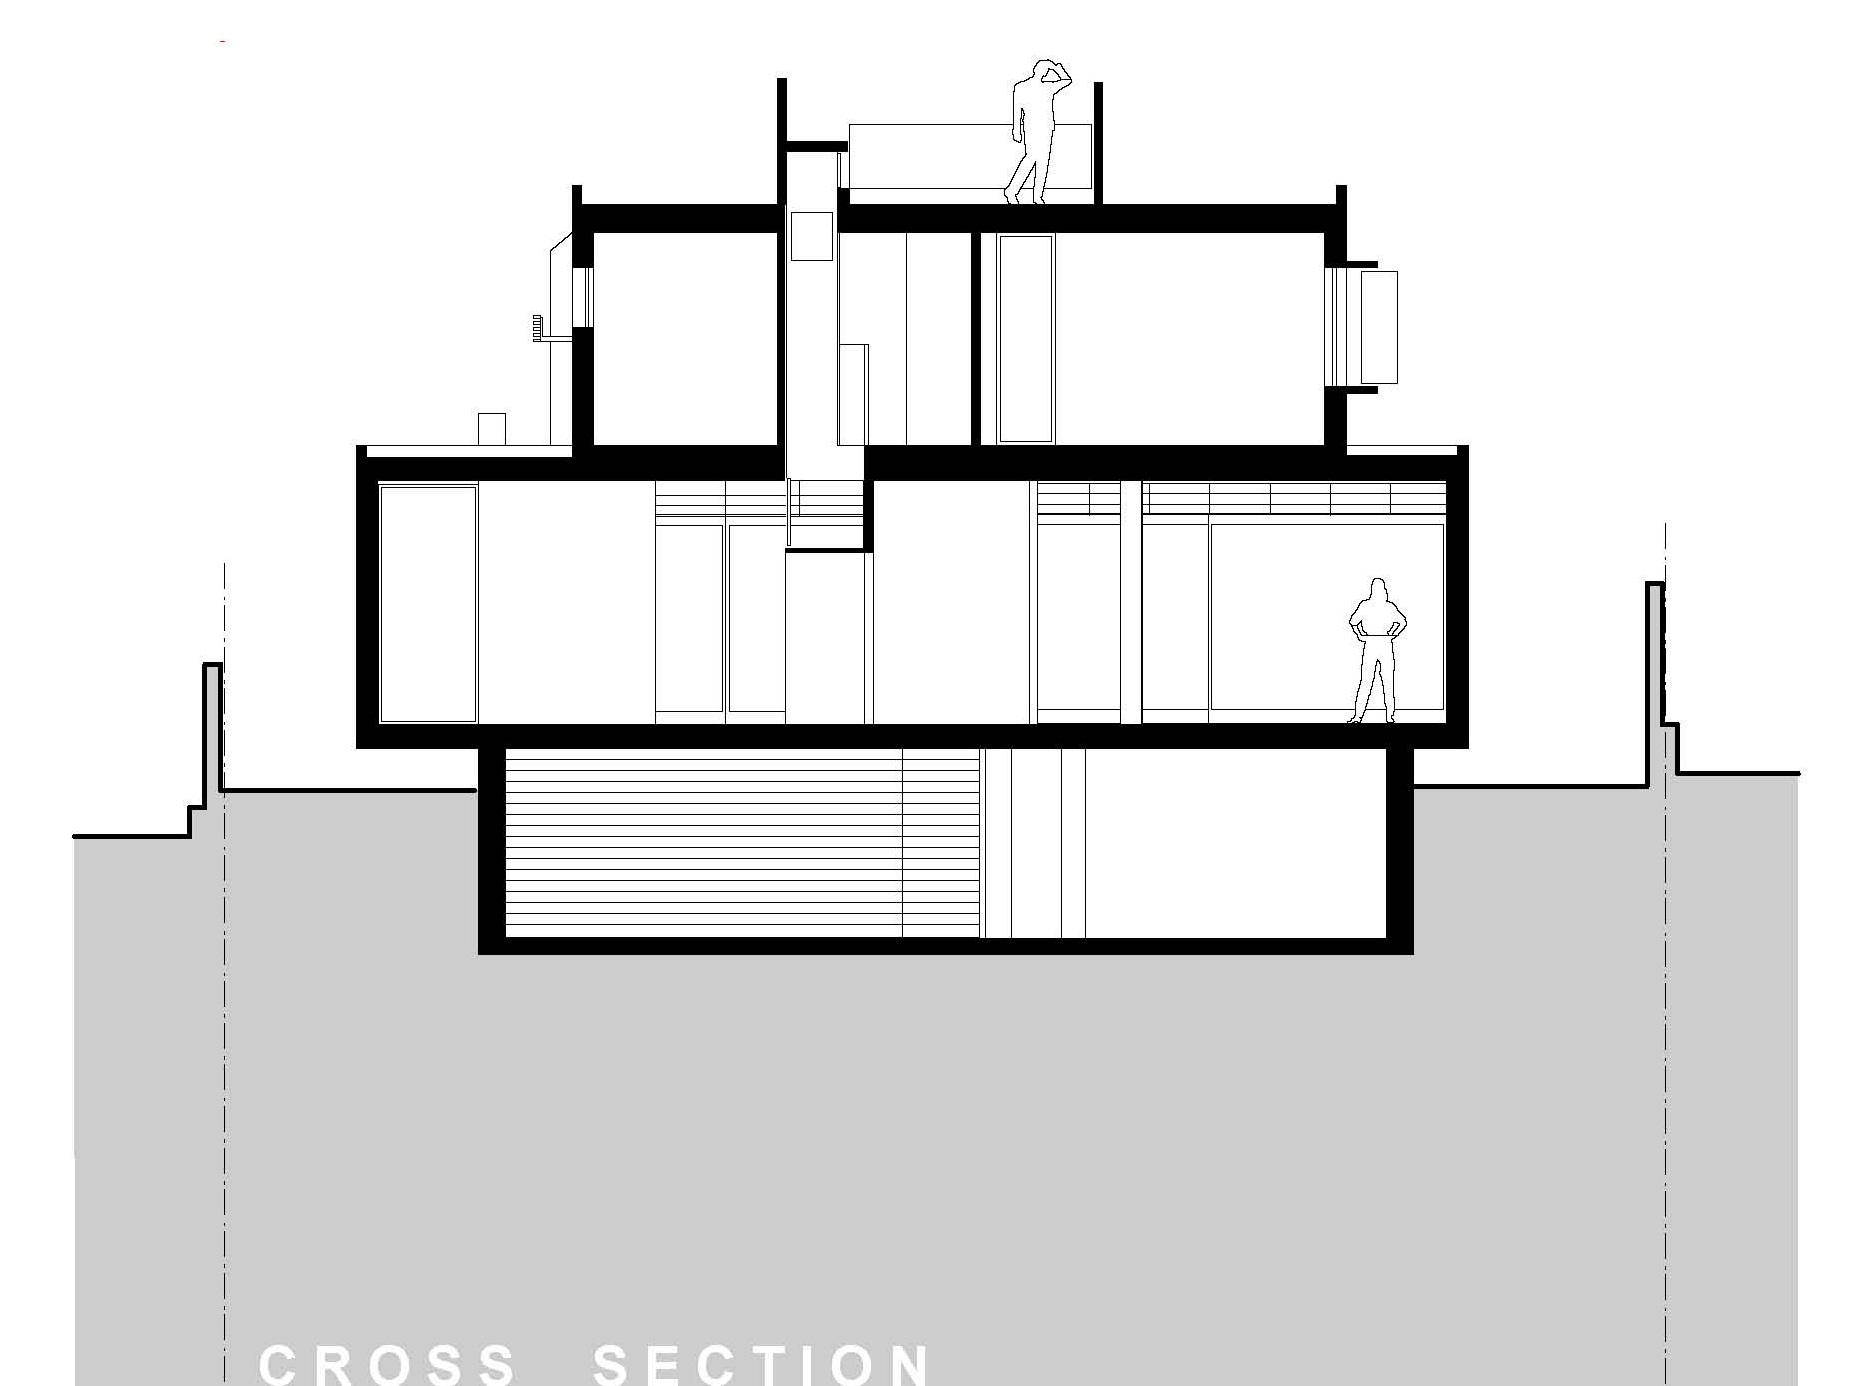 Wentworth Rd House / Edward Szewczyk Architects